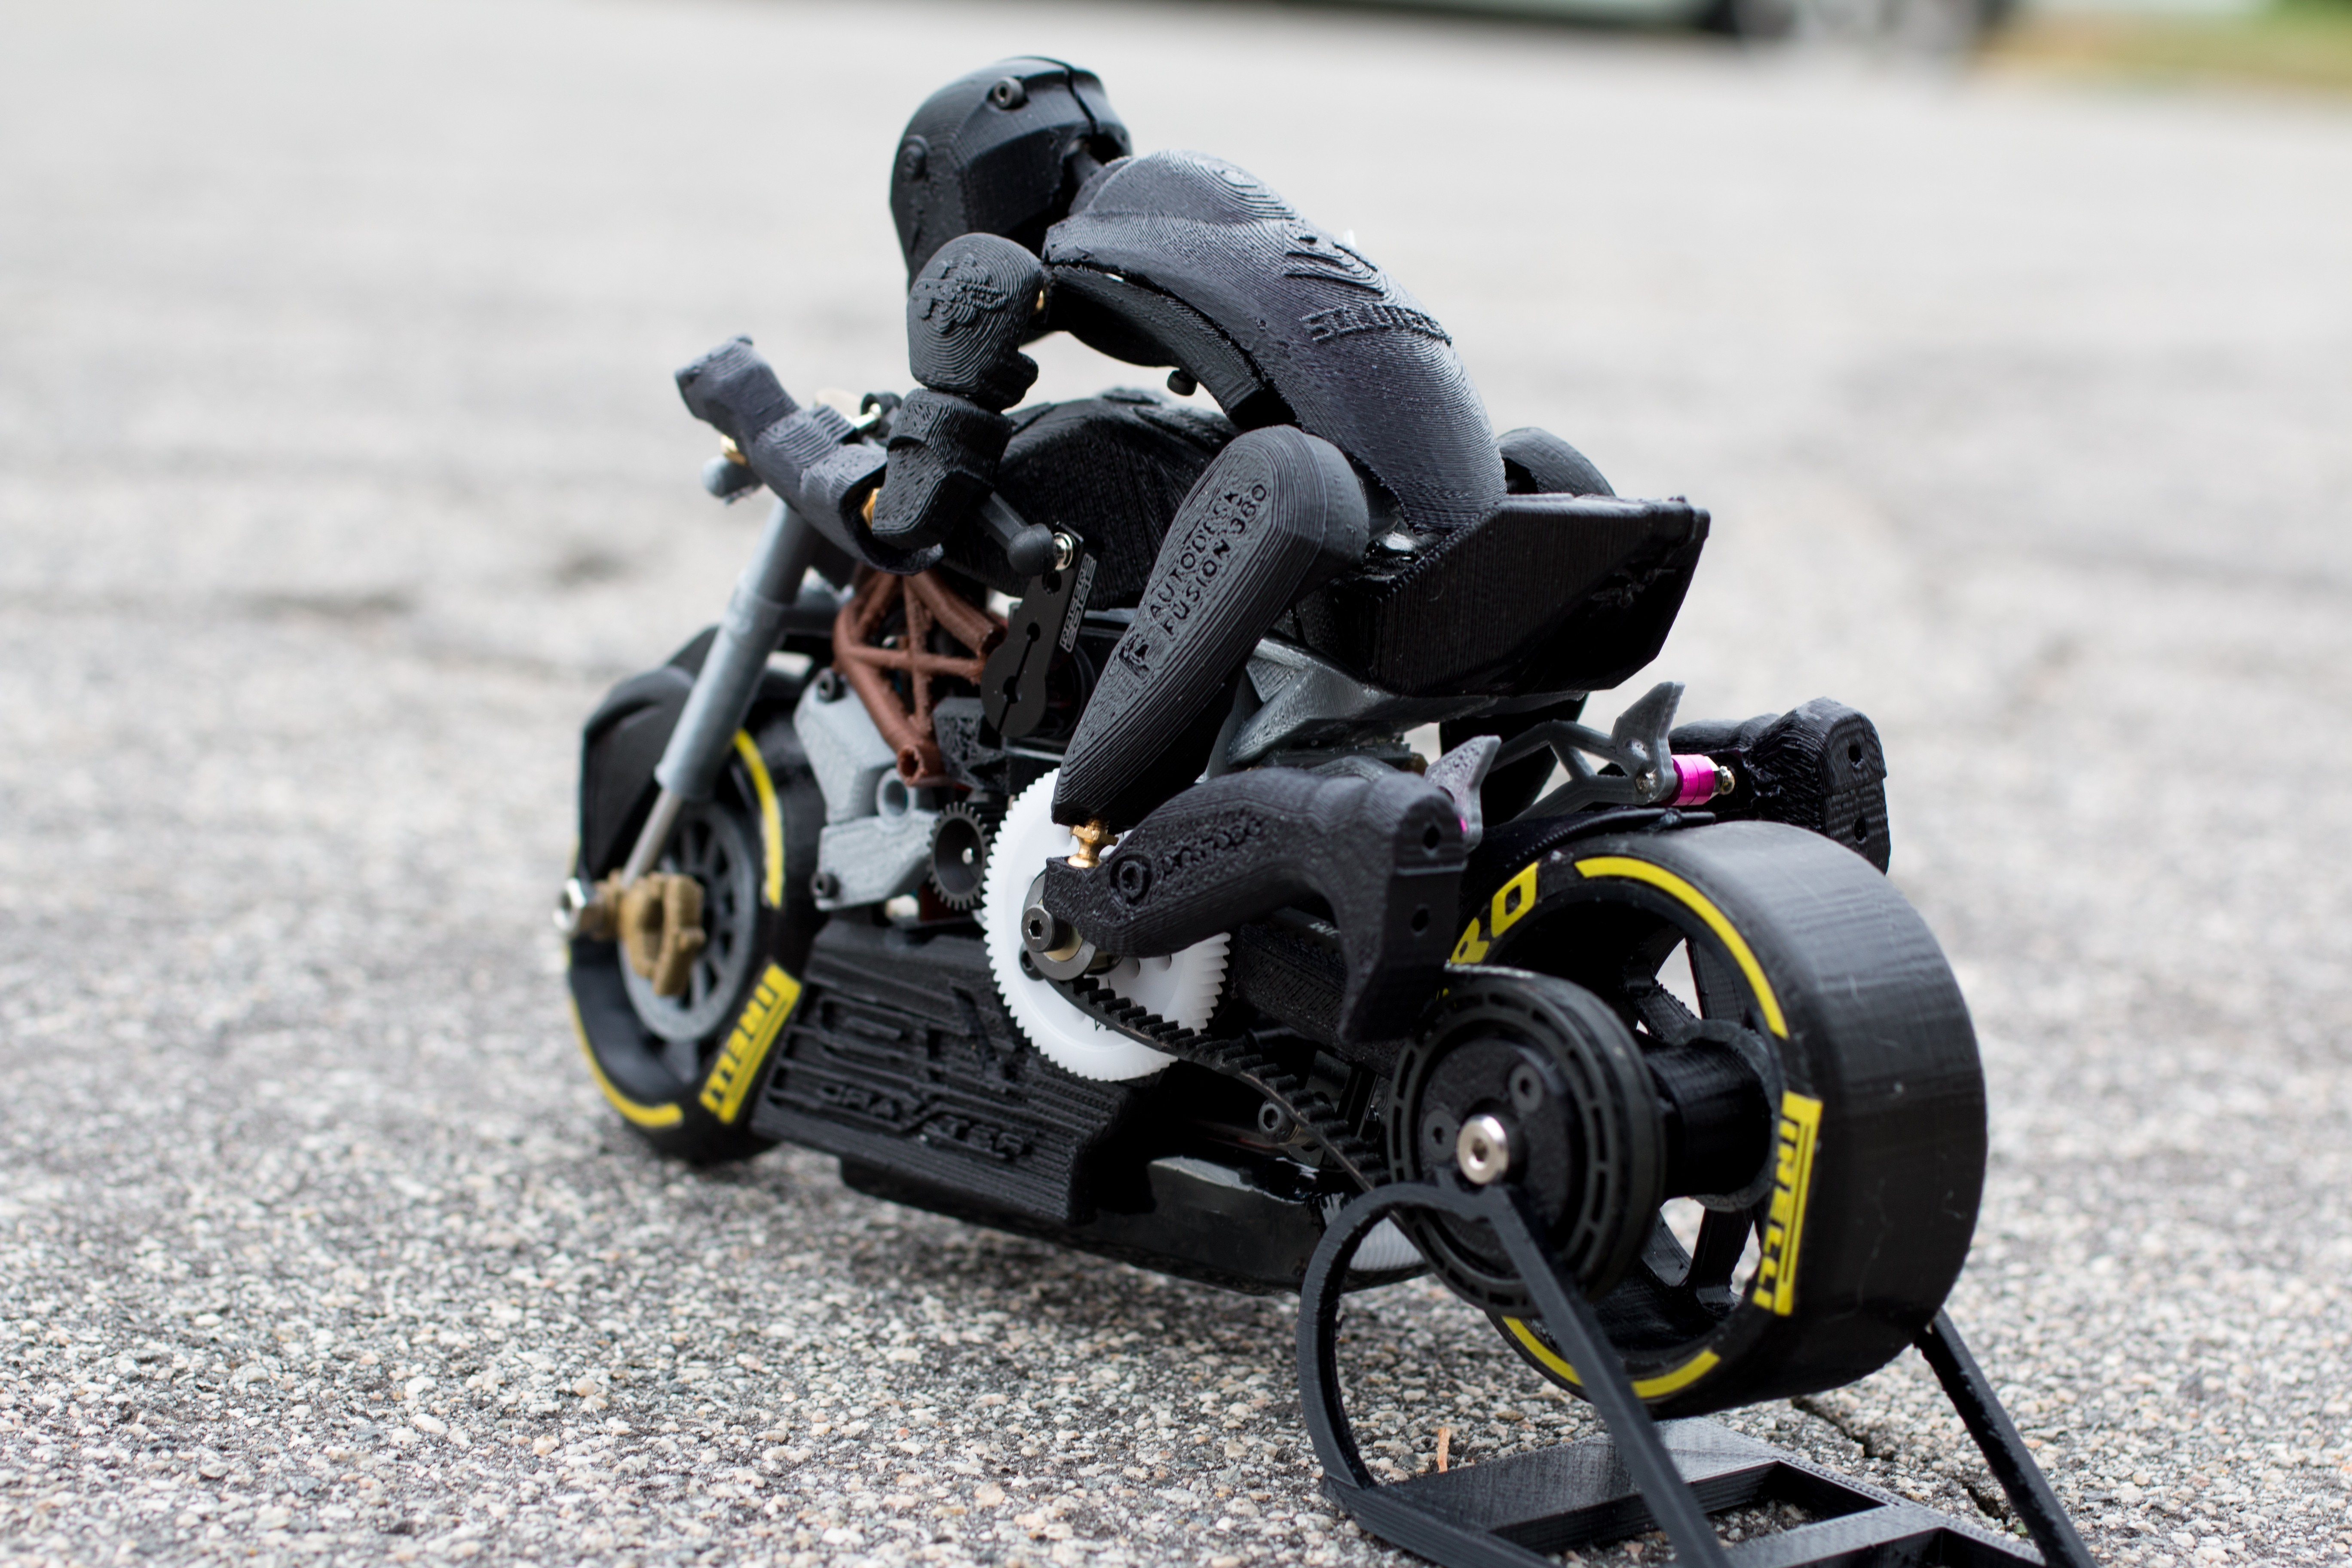 _MG_4469.jpg Download free STL file 2016 Ducati Draxter Concept Drag Bike RC • 3D printer template, brett